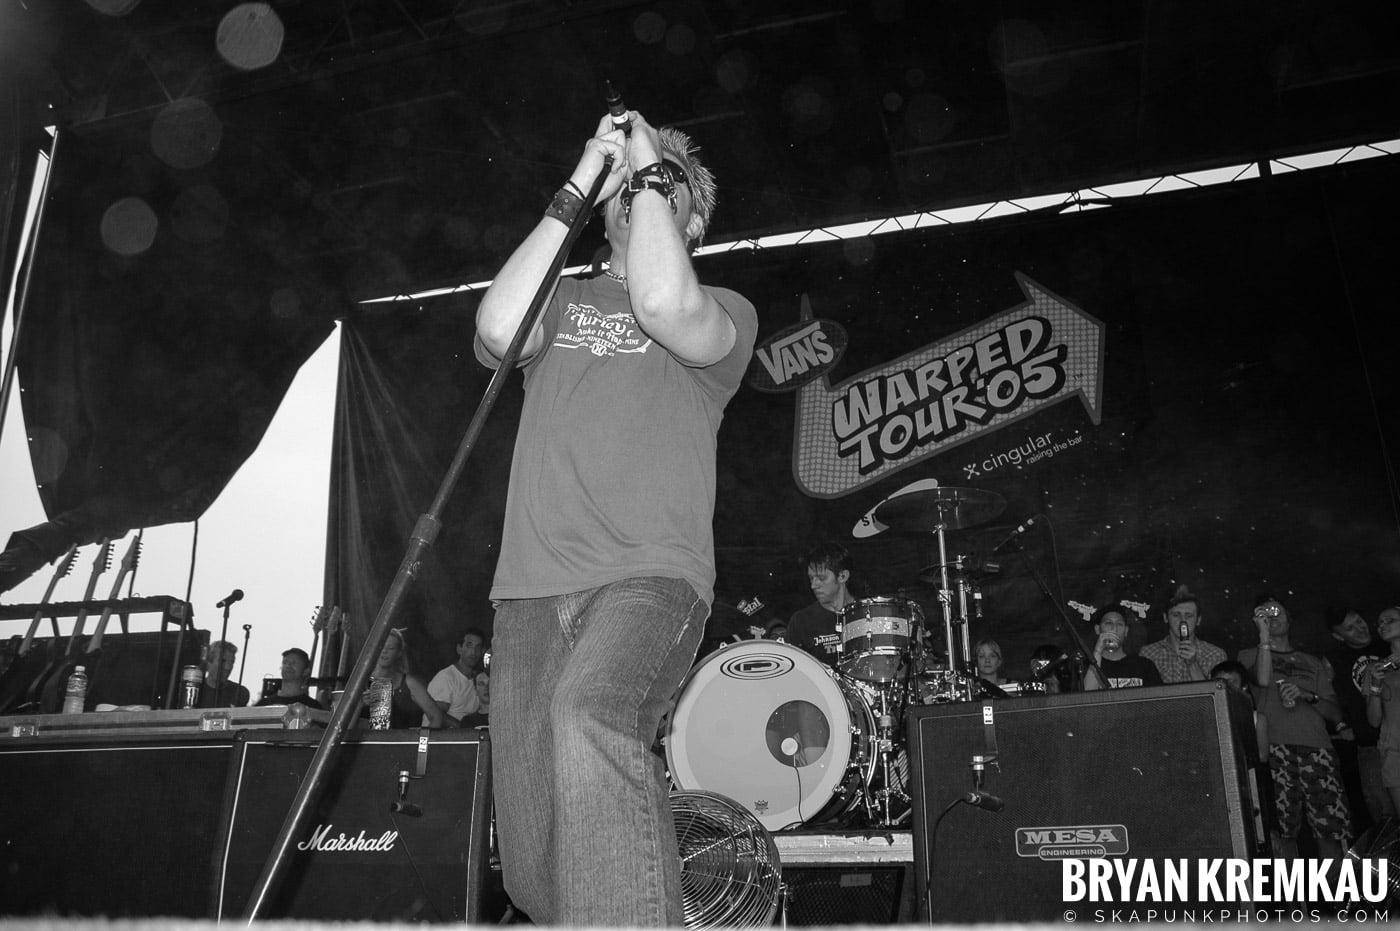 The Offspring @ Warped Tour 05, NYC - 8.12.05 (17)